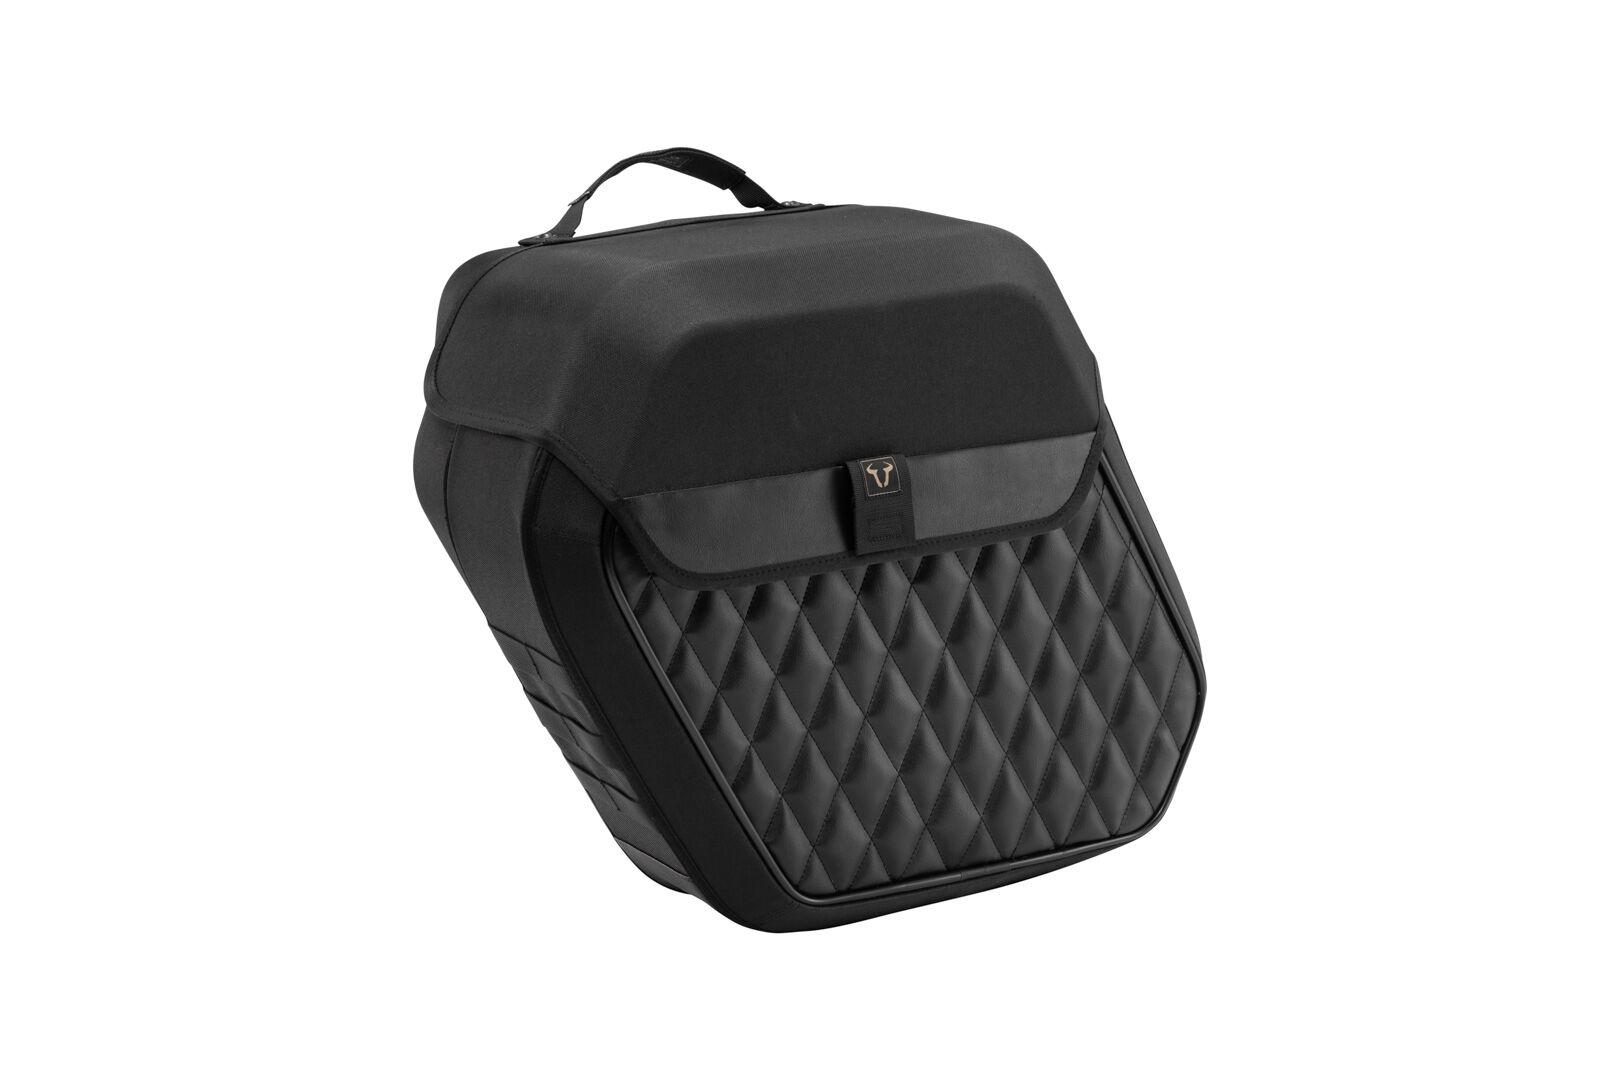 SW-Motech Legend Gear side bag system LH - Harley-Davidson Softail Fat Bob (17-)